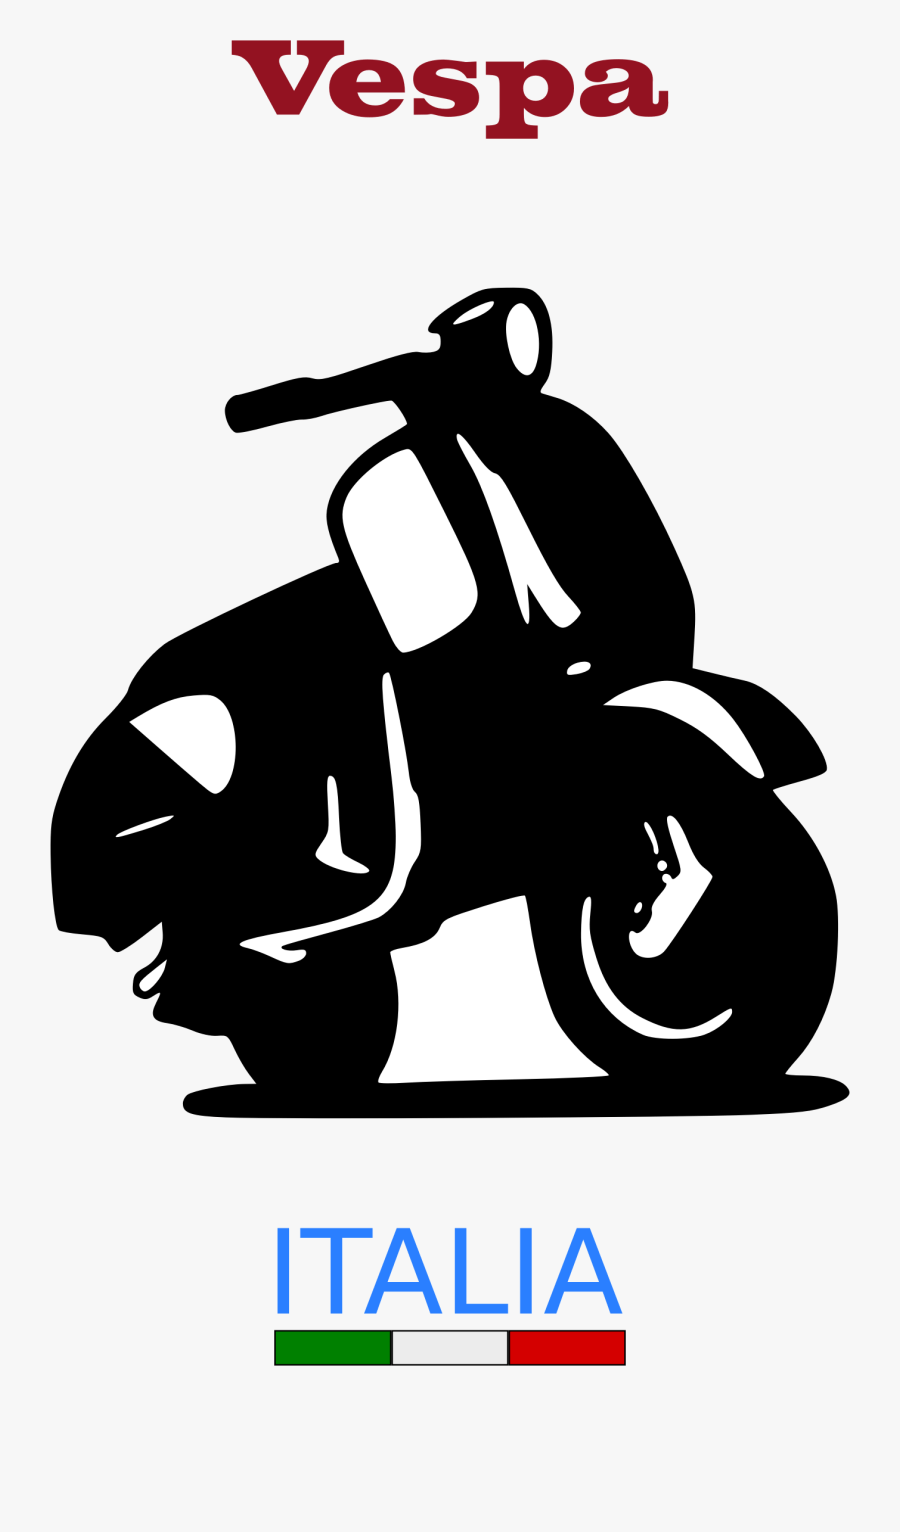 Vespa Logo Vector : vespa, vector, Vespa, Italia, Transparent, Clipart, ClipartKey